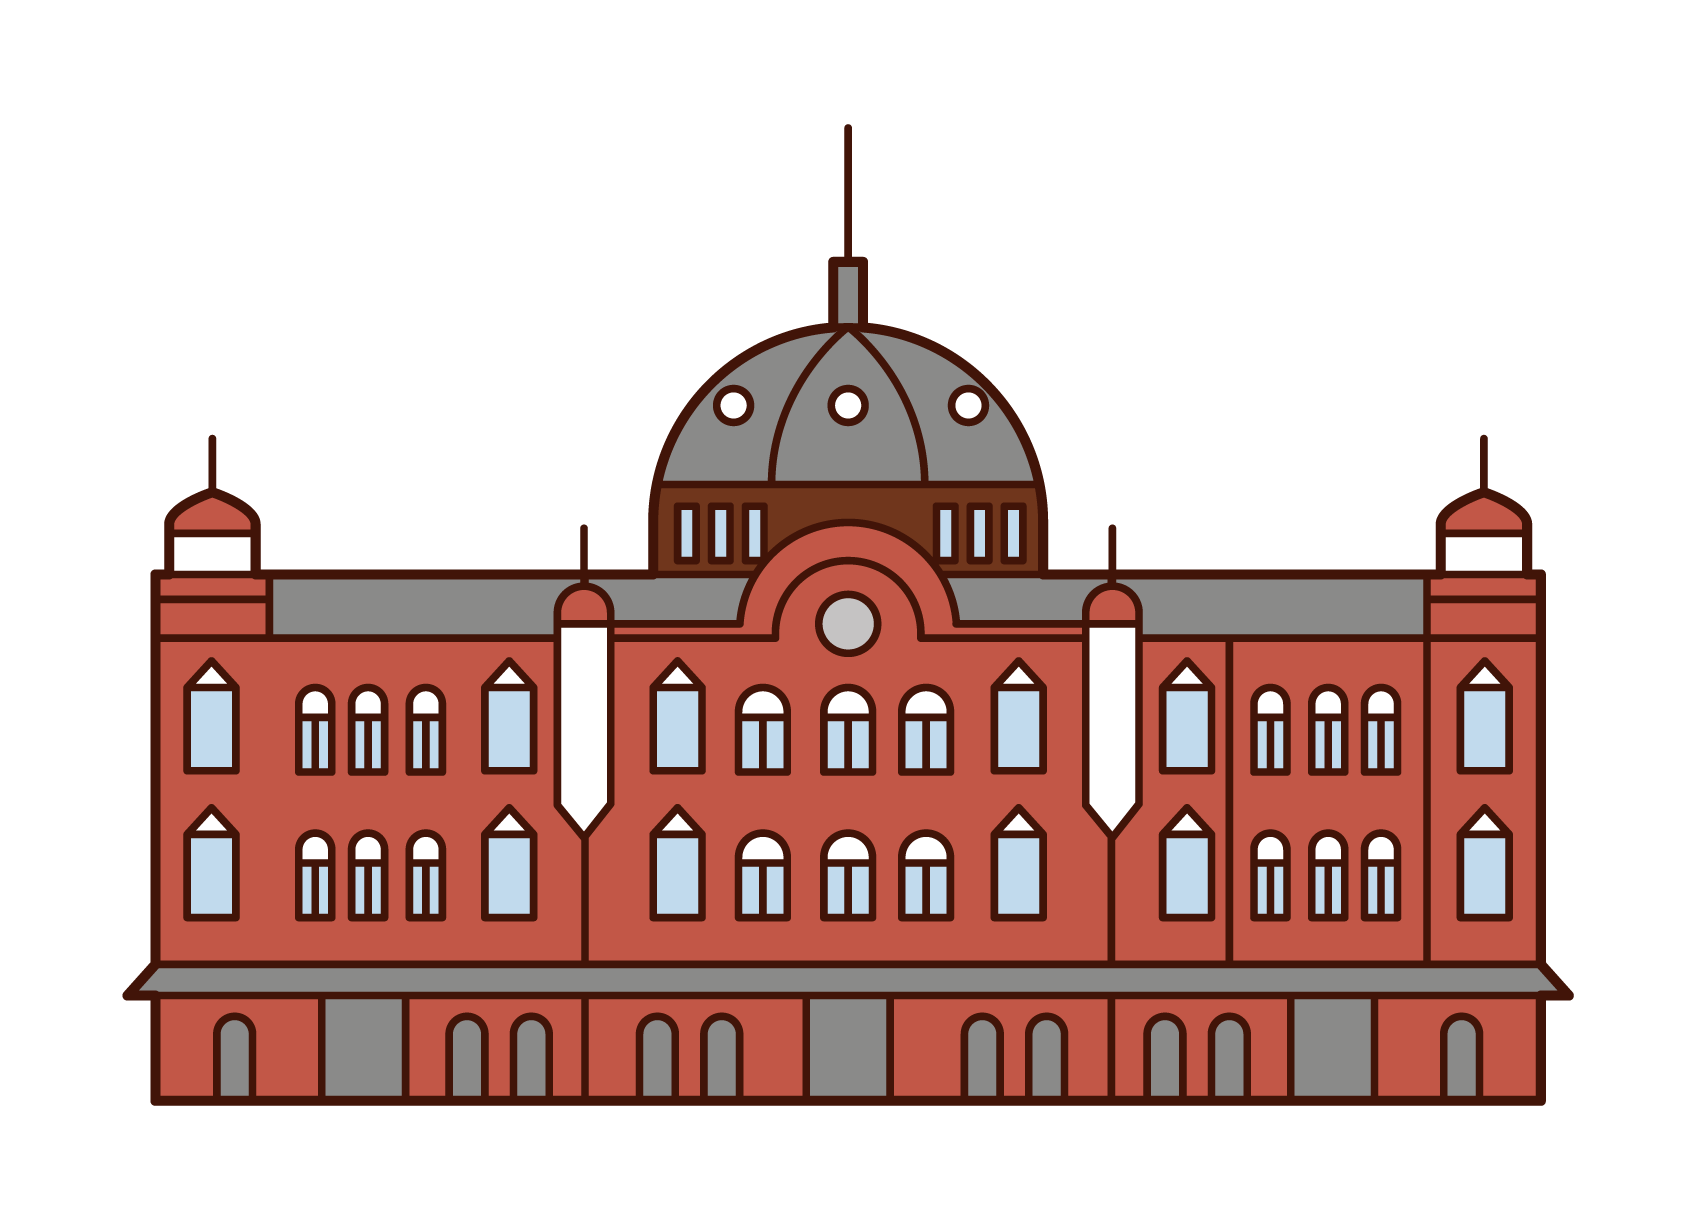 Illustration of Tokyo Station